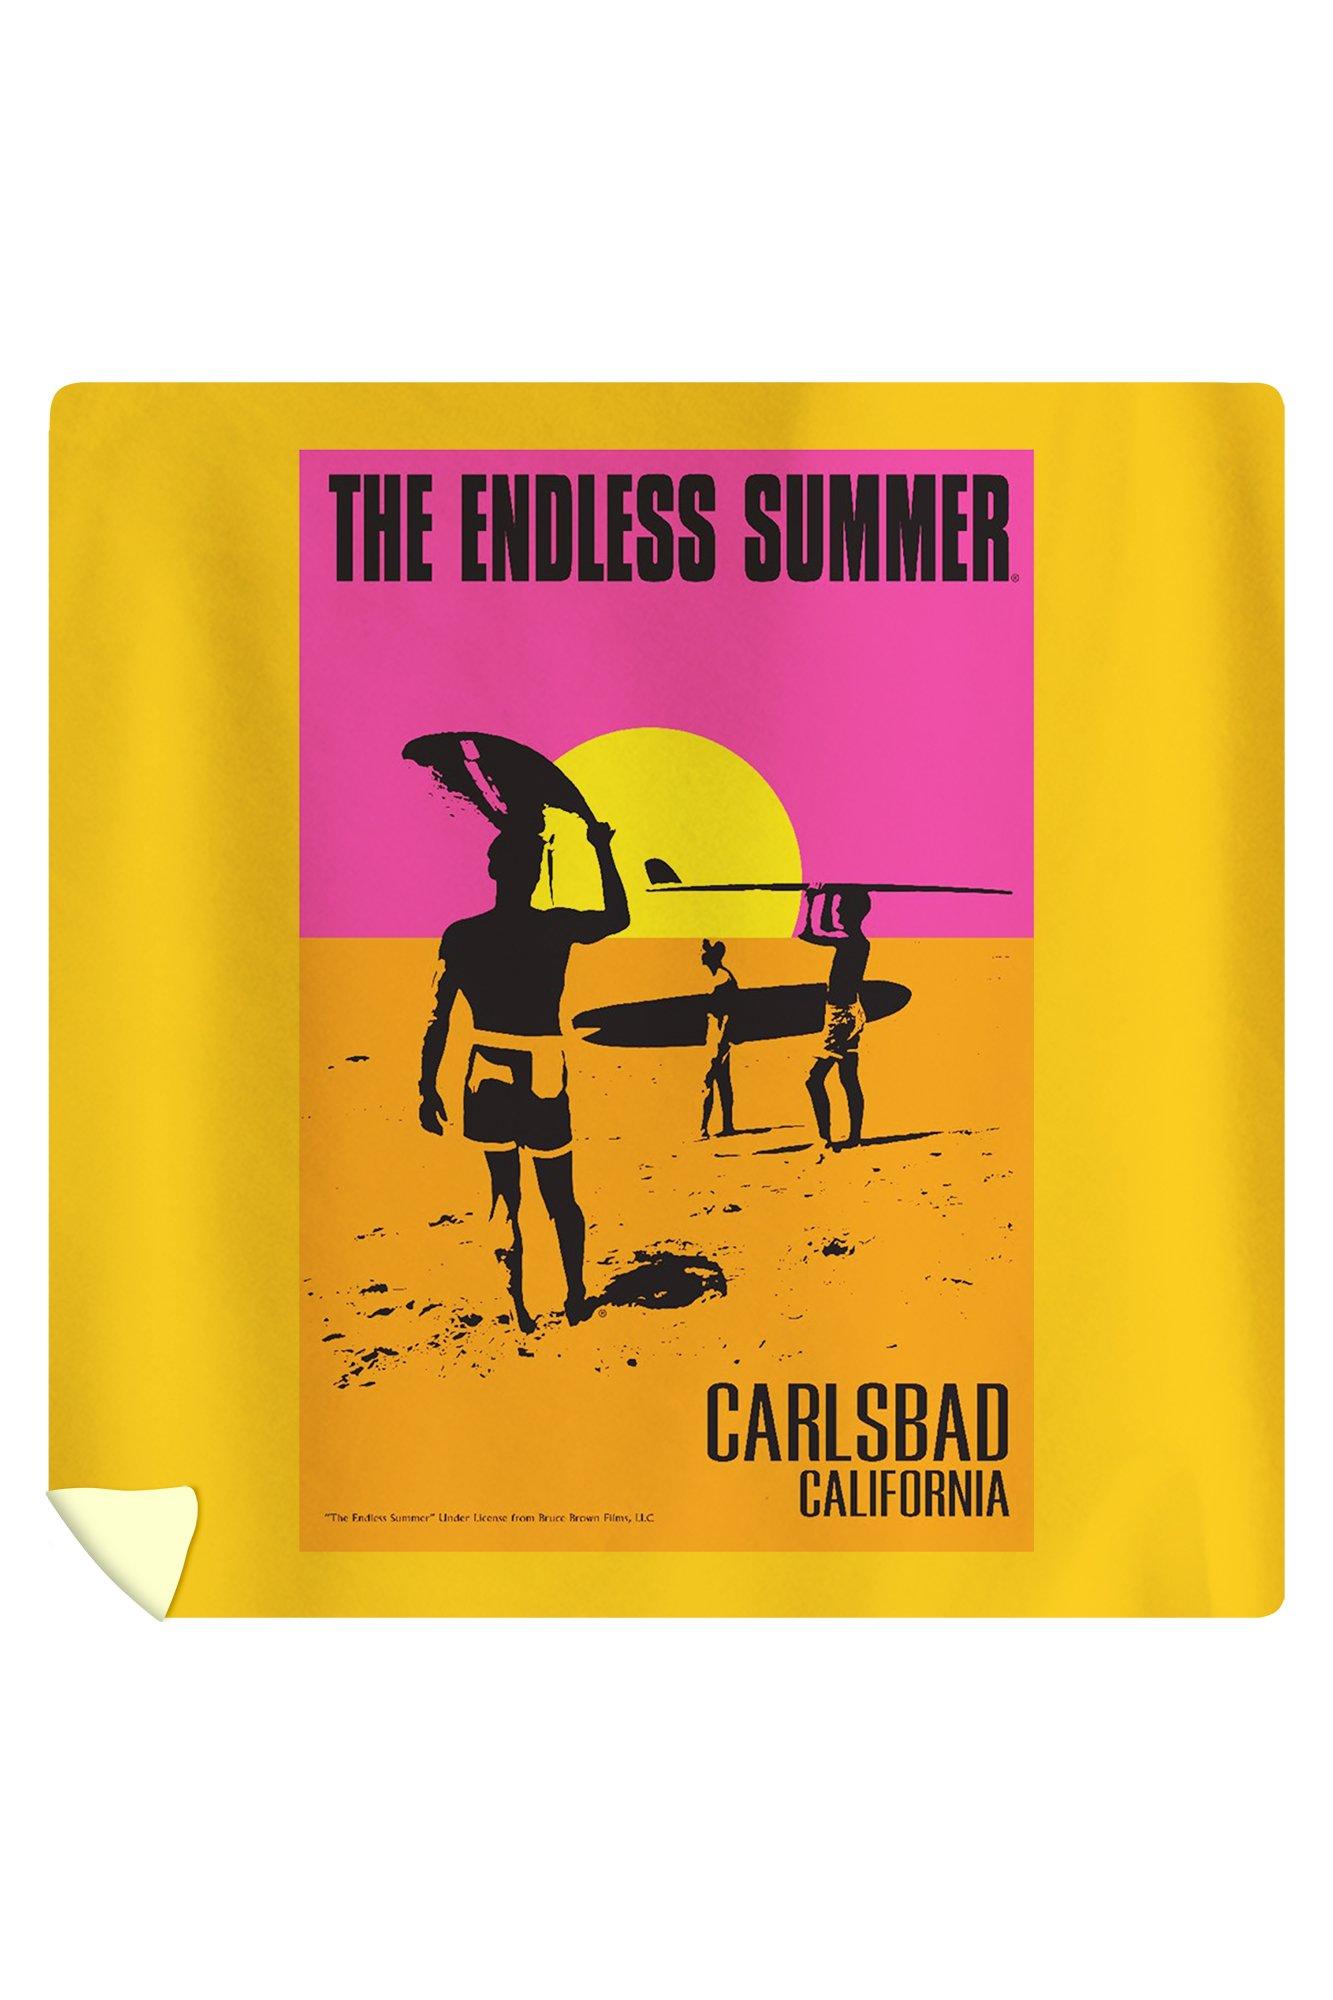 Carlsbad, California - The Endless Summer - Original Movie Poster (88x88 Queen Microfiber Duvet Cover)